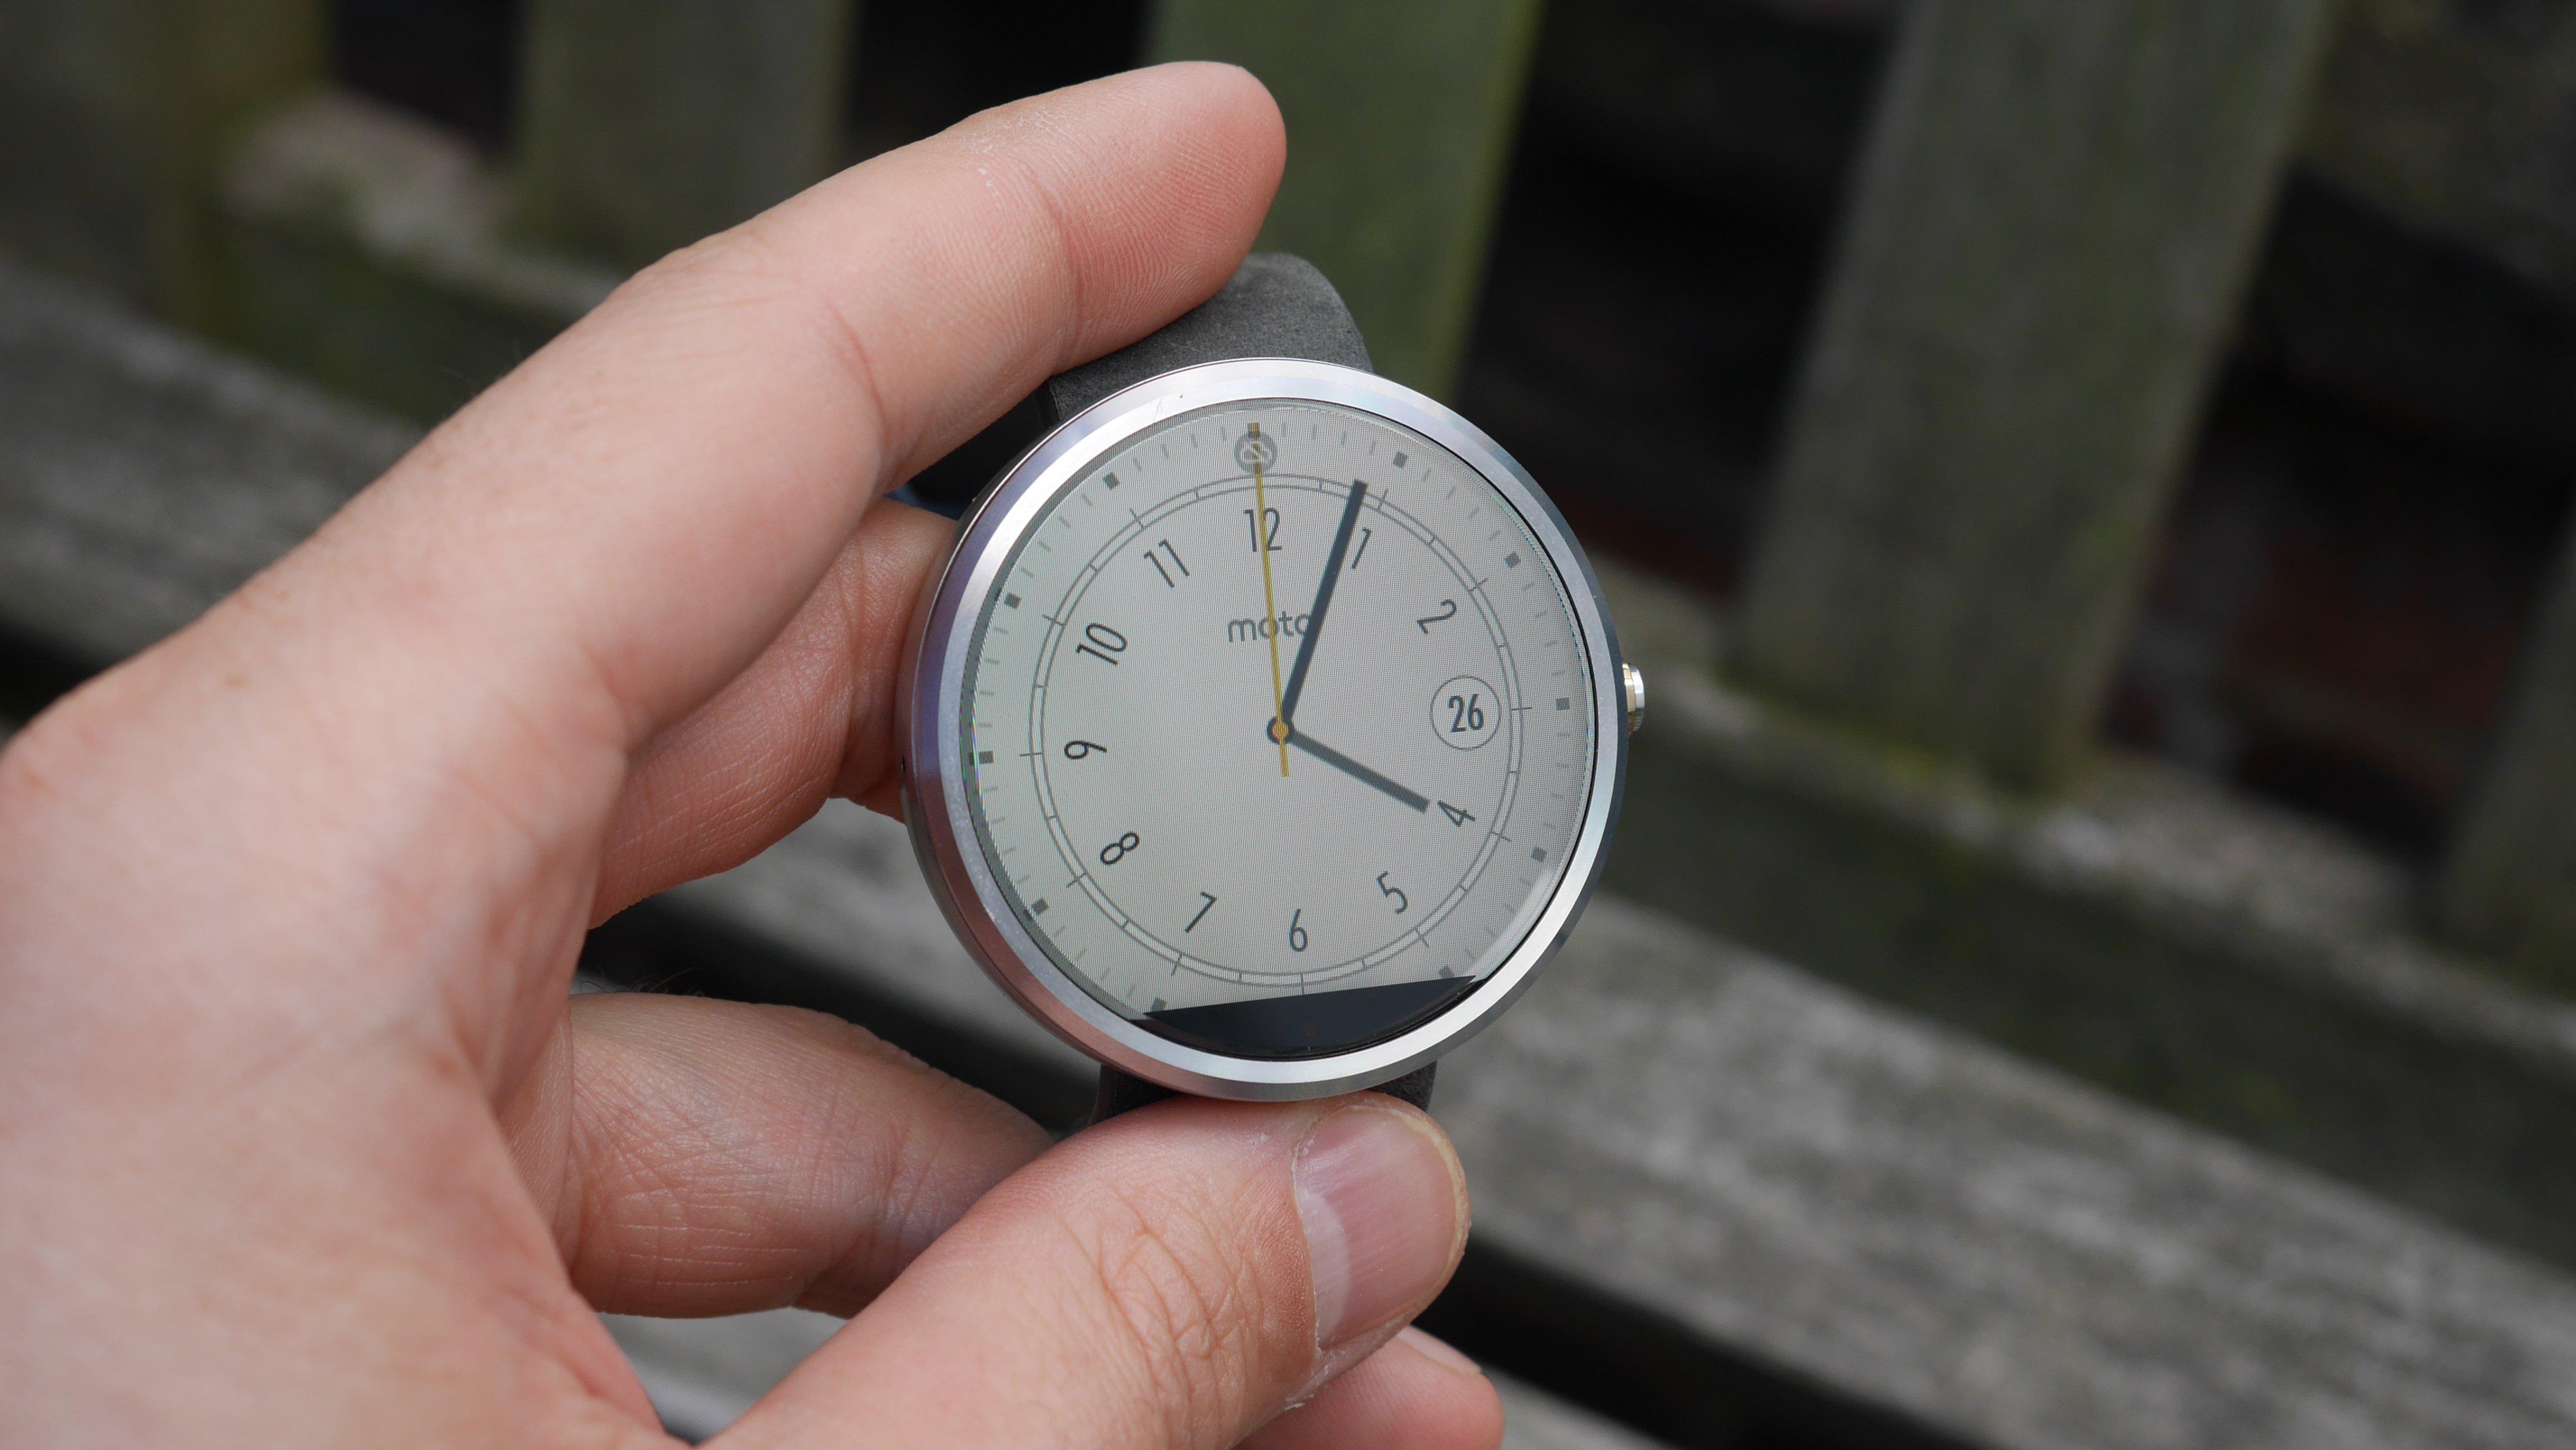 Motorola Moto 360 Smart Watches